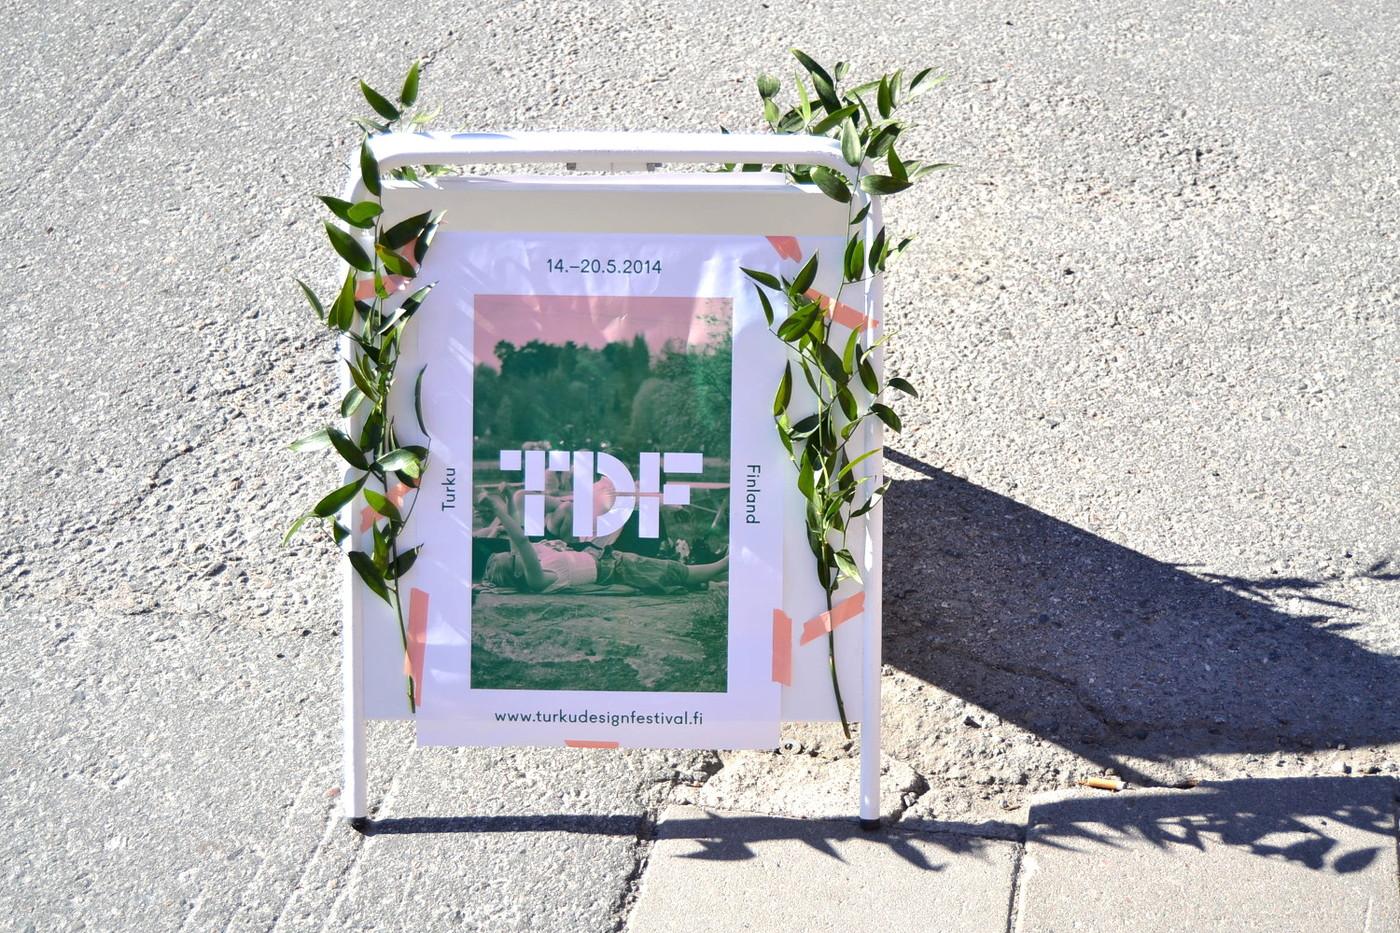 TDF ja ihana viikonloppu